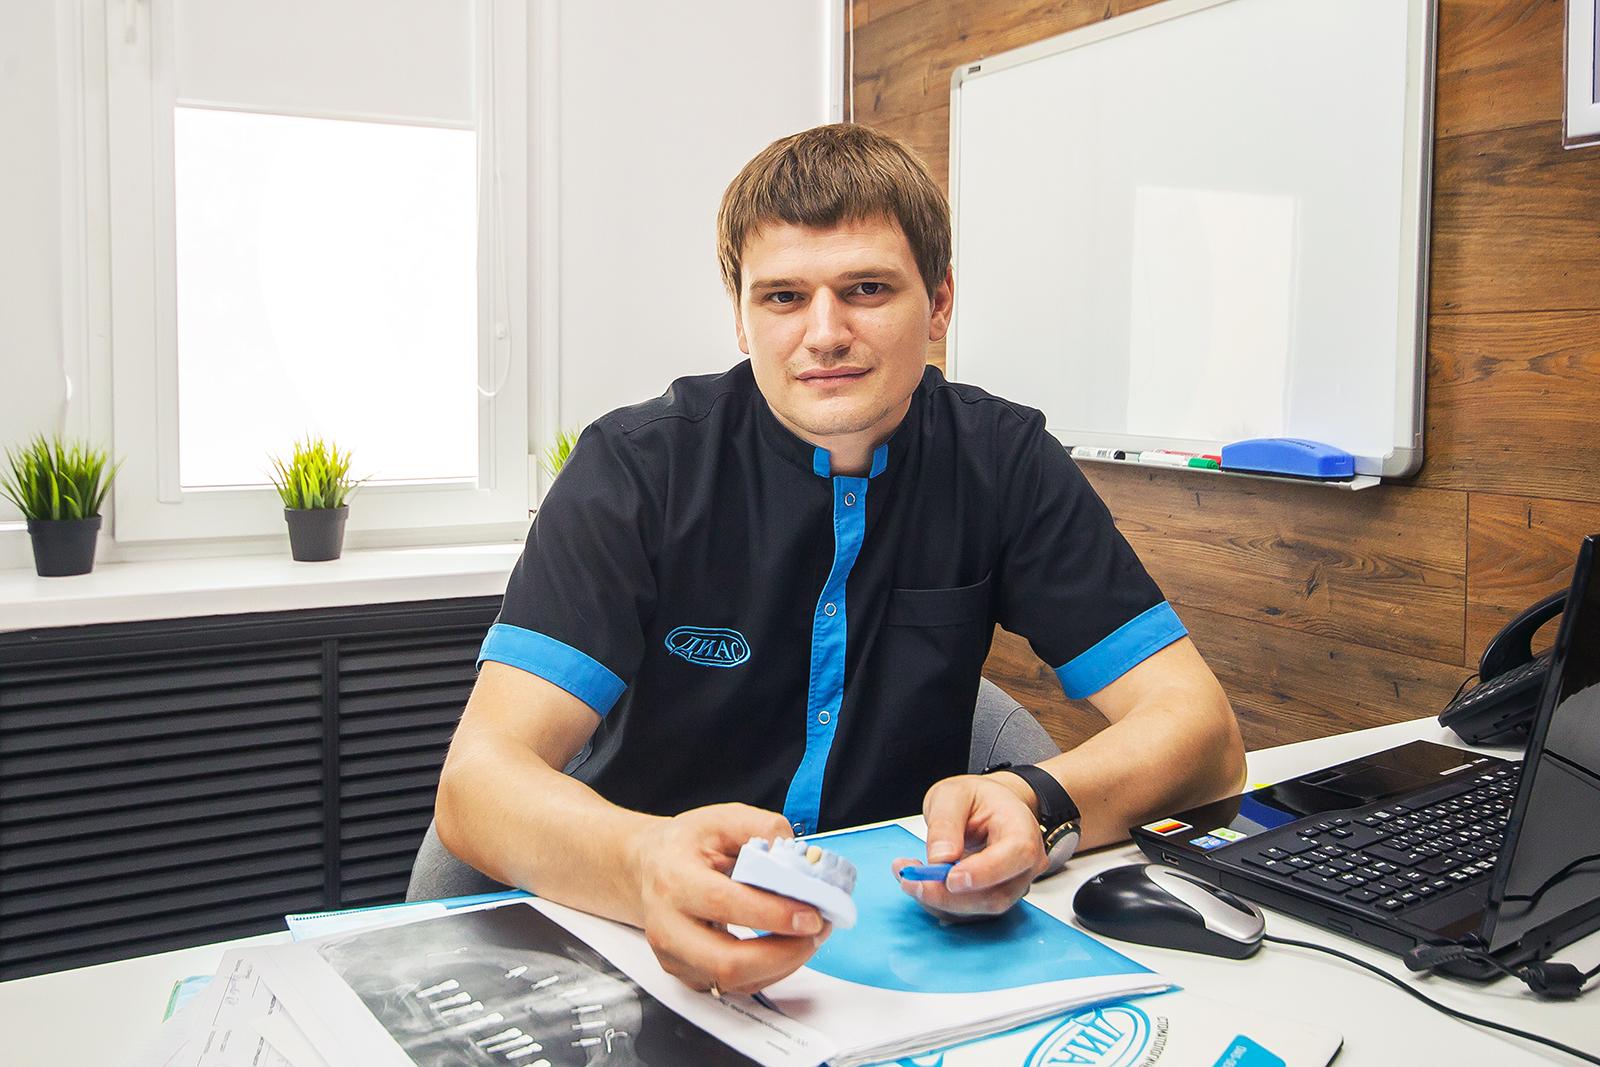 Герман Валентинович Таран, главный врач клиники «Диас»